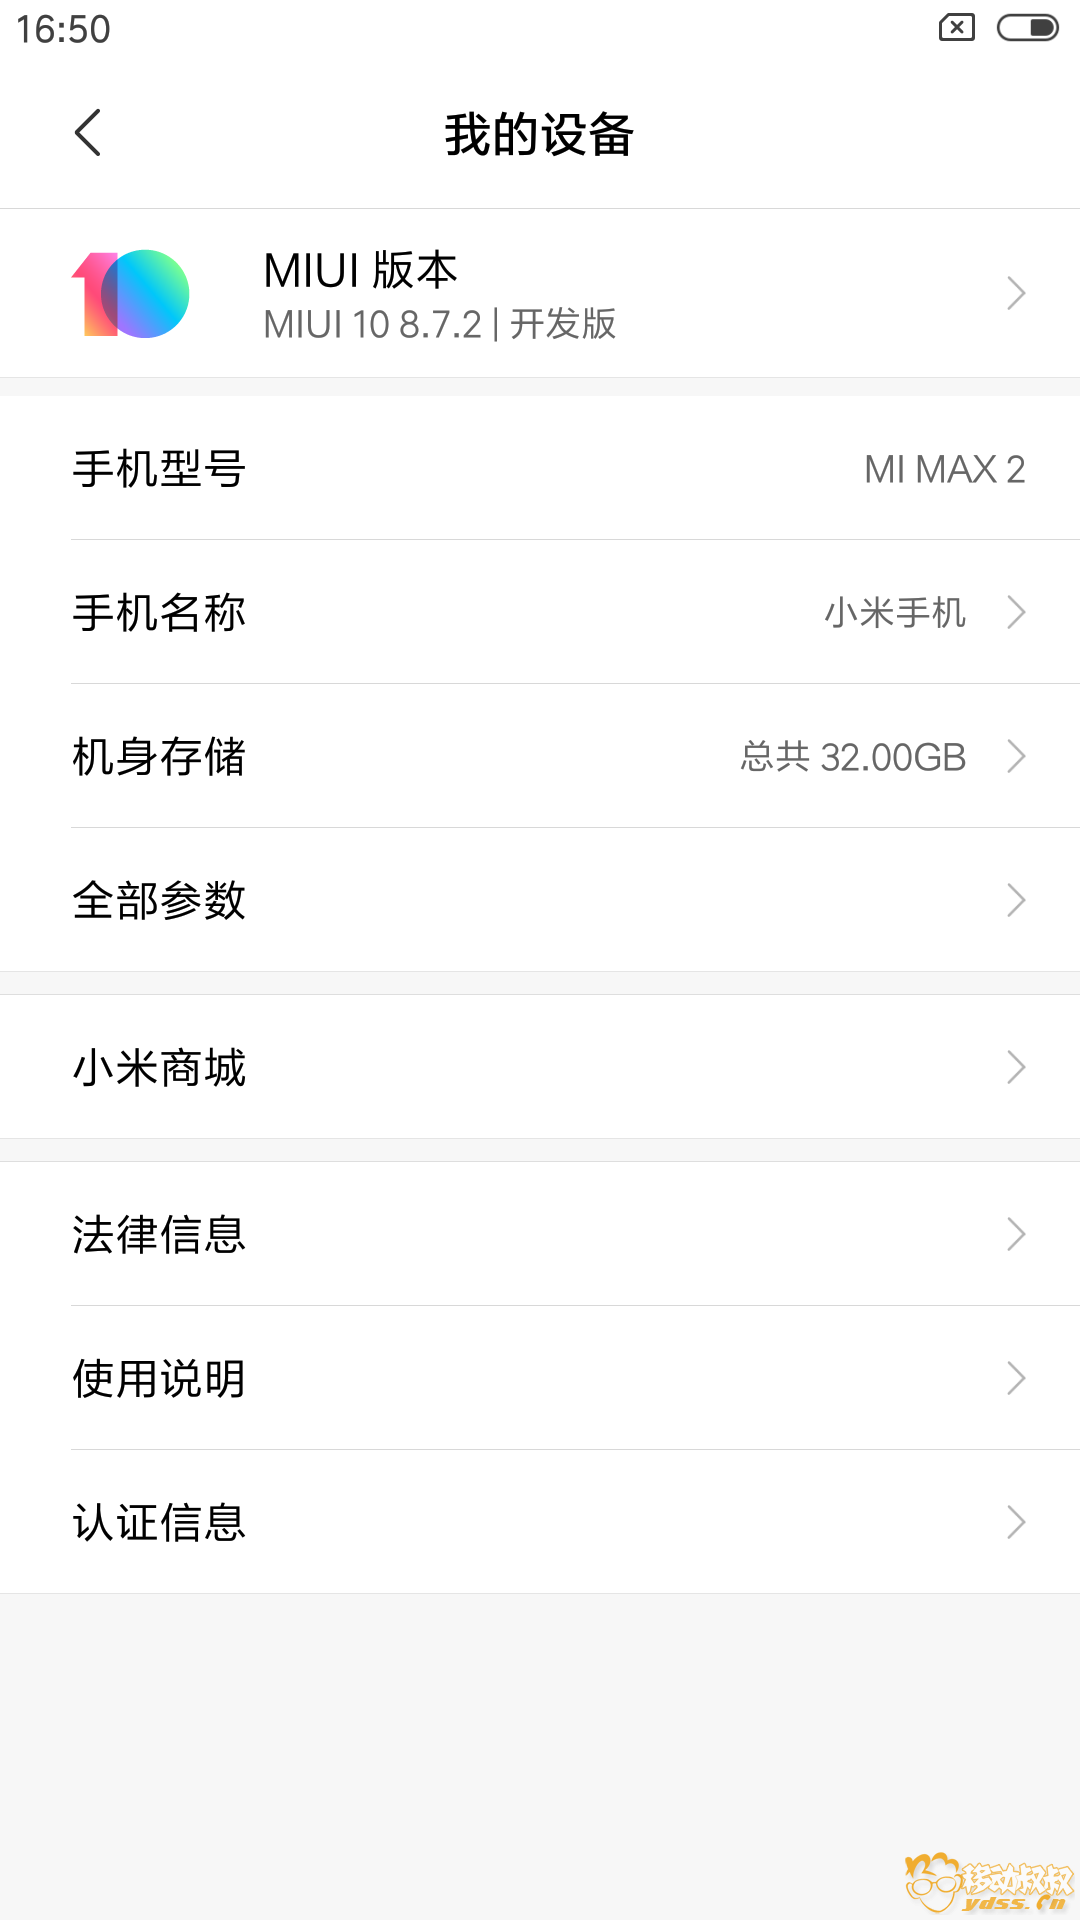 Screenshot_2018-07-05-16-50-10-516_com.android.settings.png